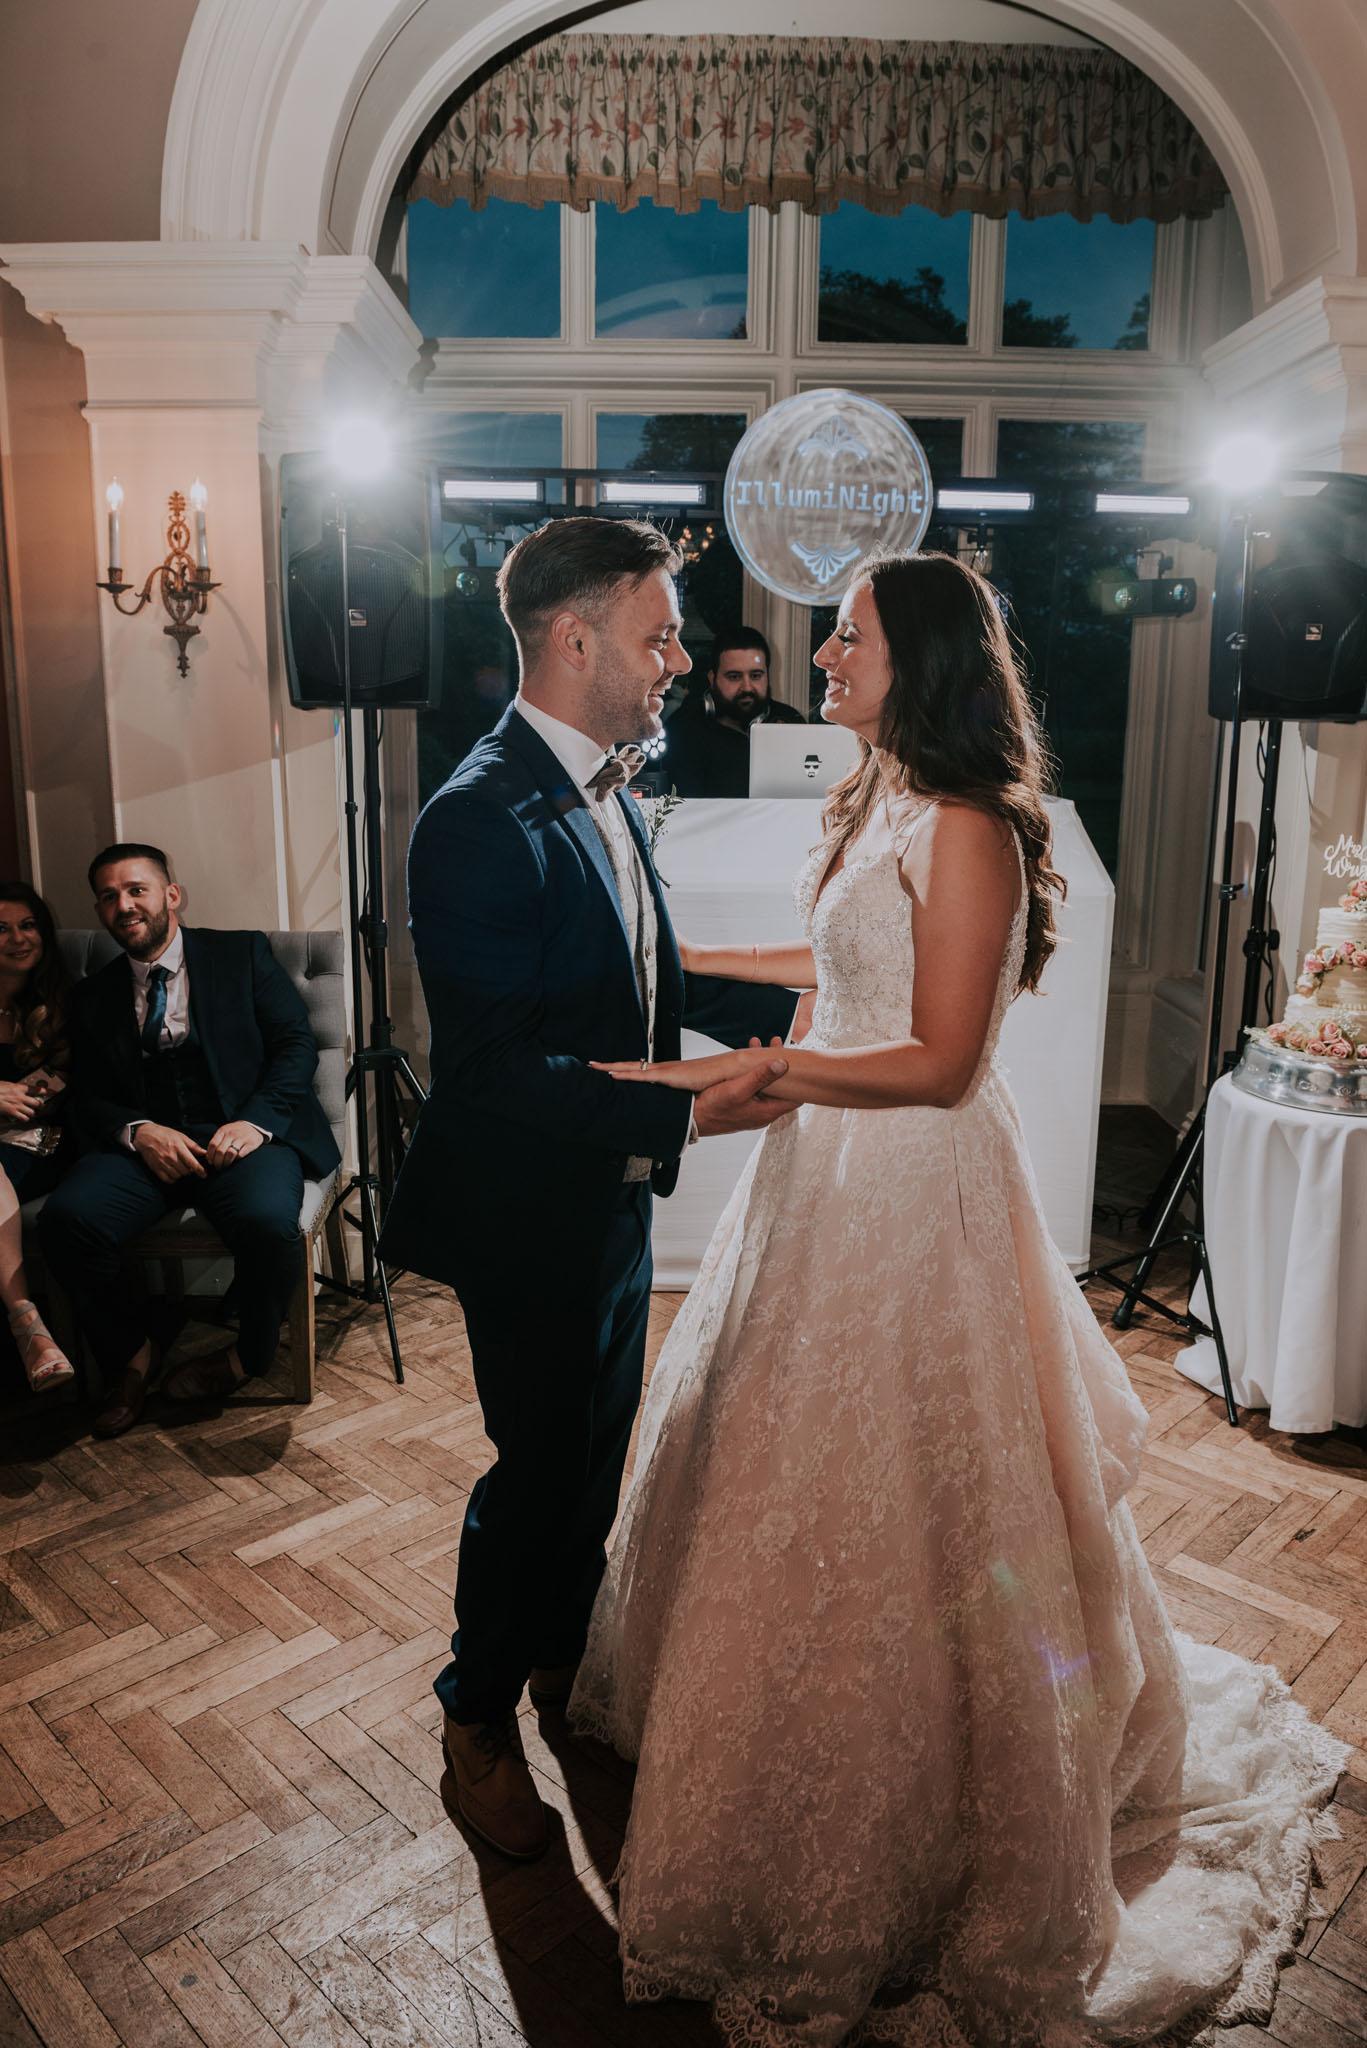 wedding-photographer-glewstone-court-hereford-scott-stockwell-photography477.jpg